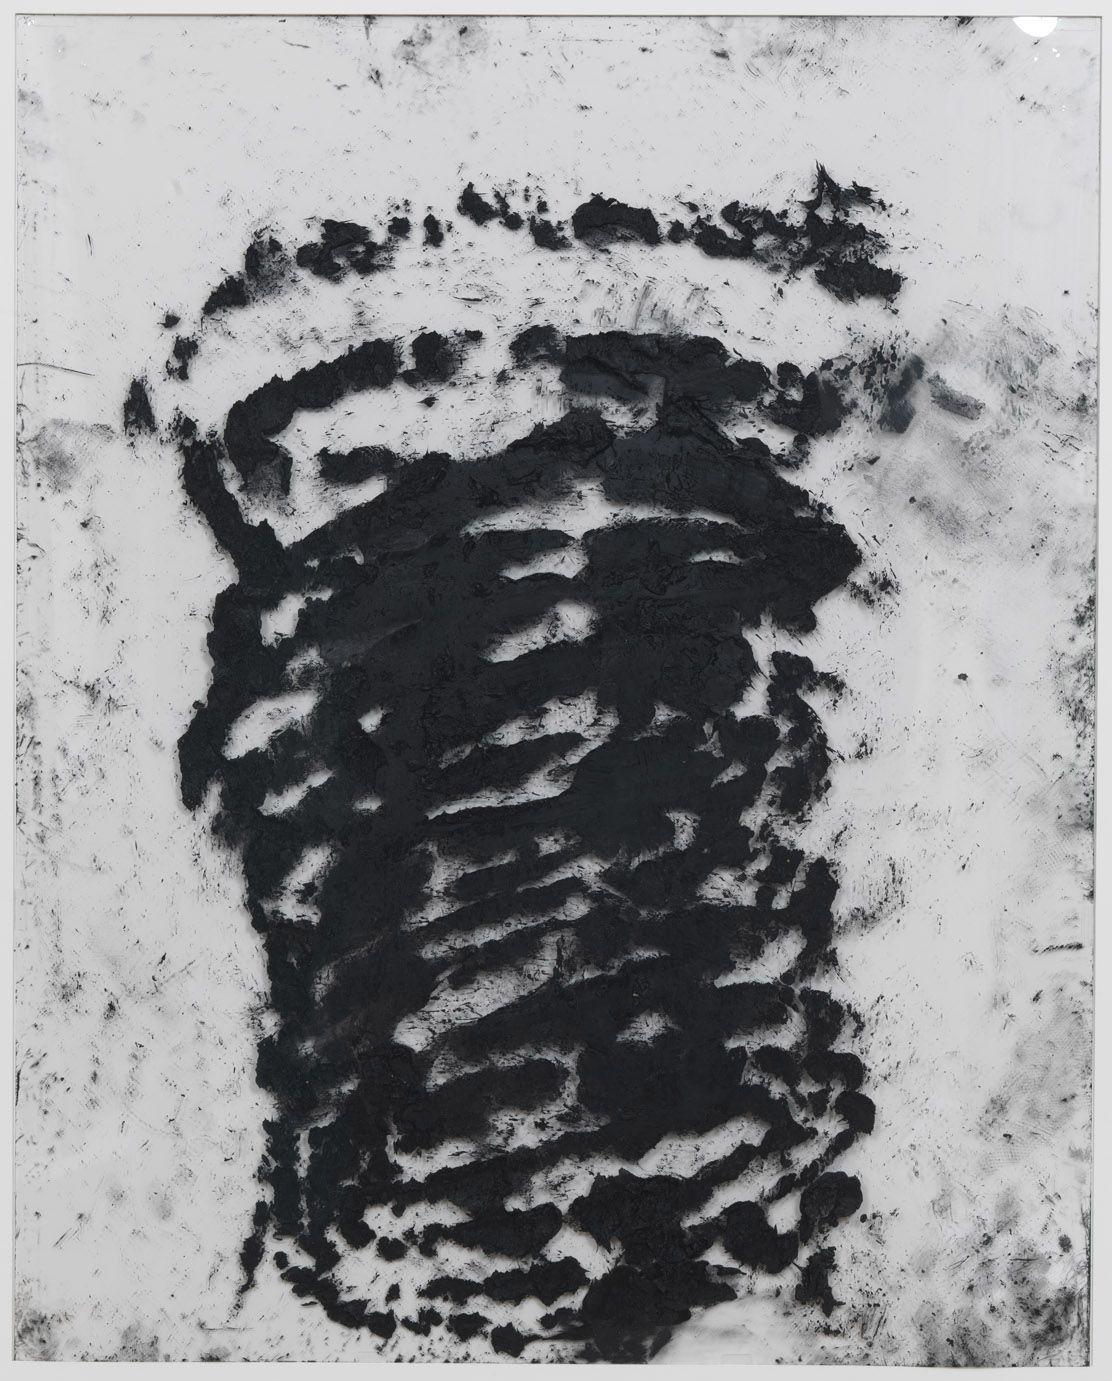 Richard Serra,Transparency #11, 2012.